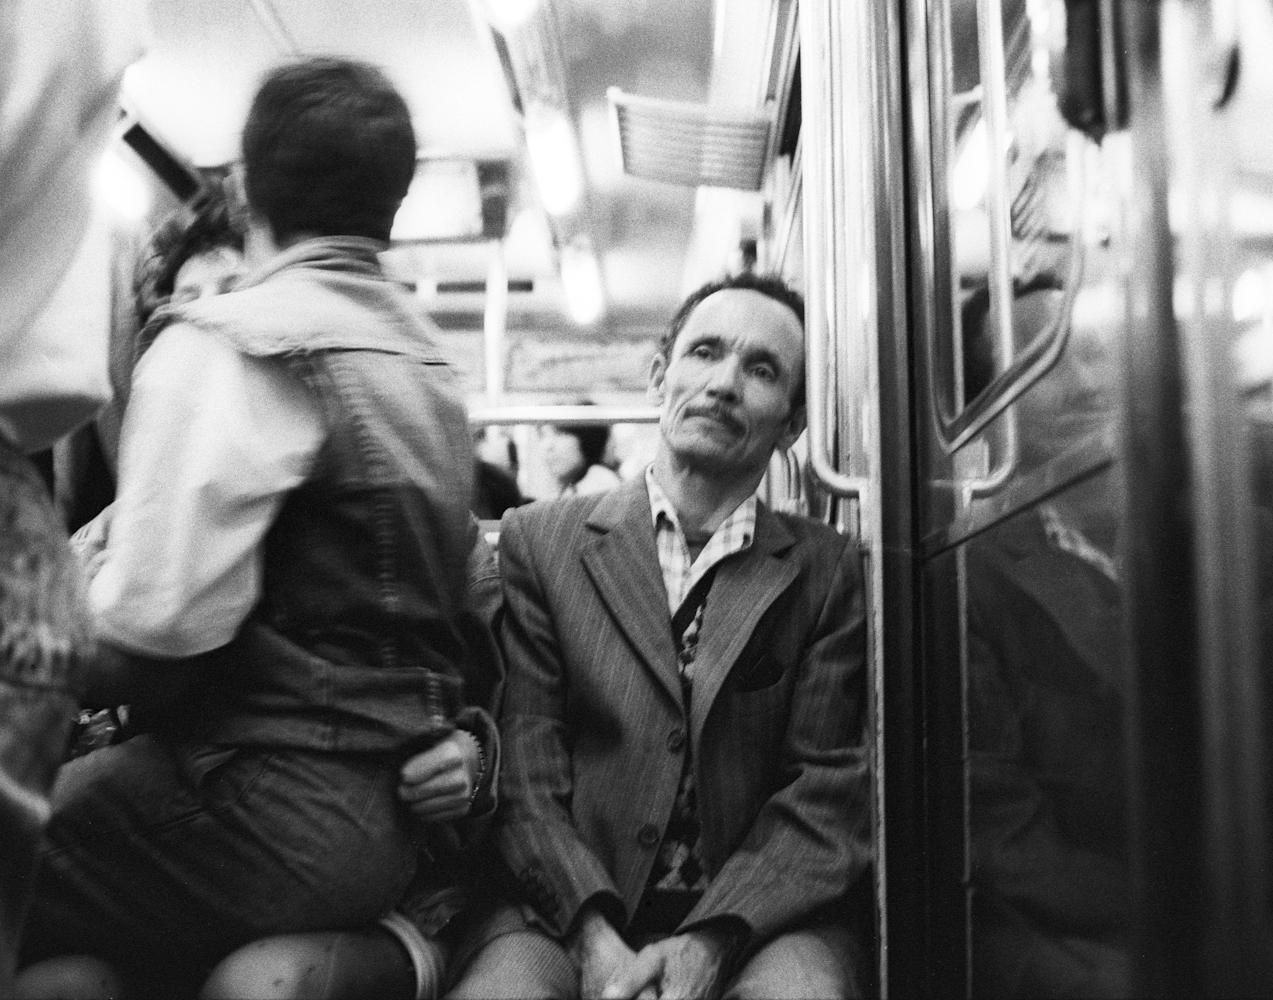 metro_11x14.jpg